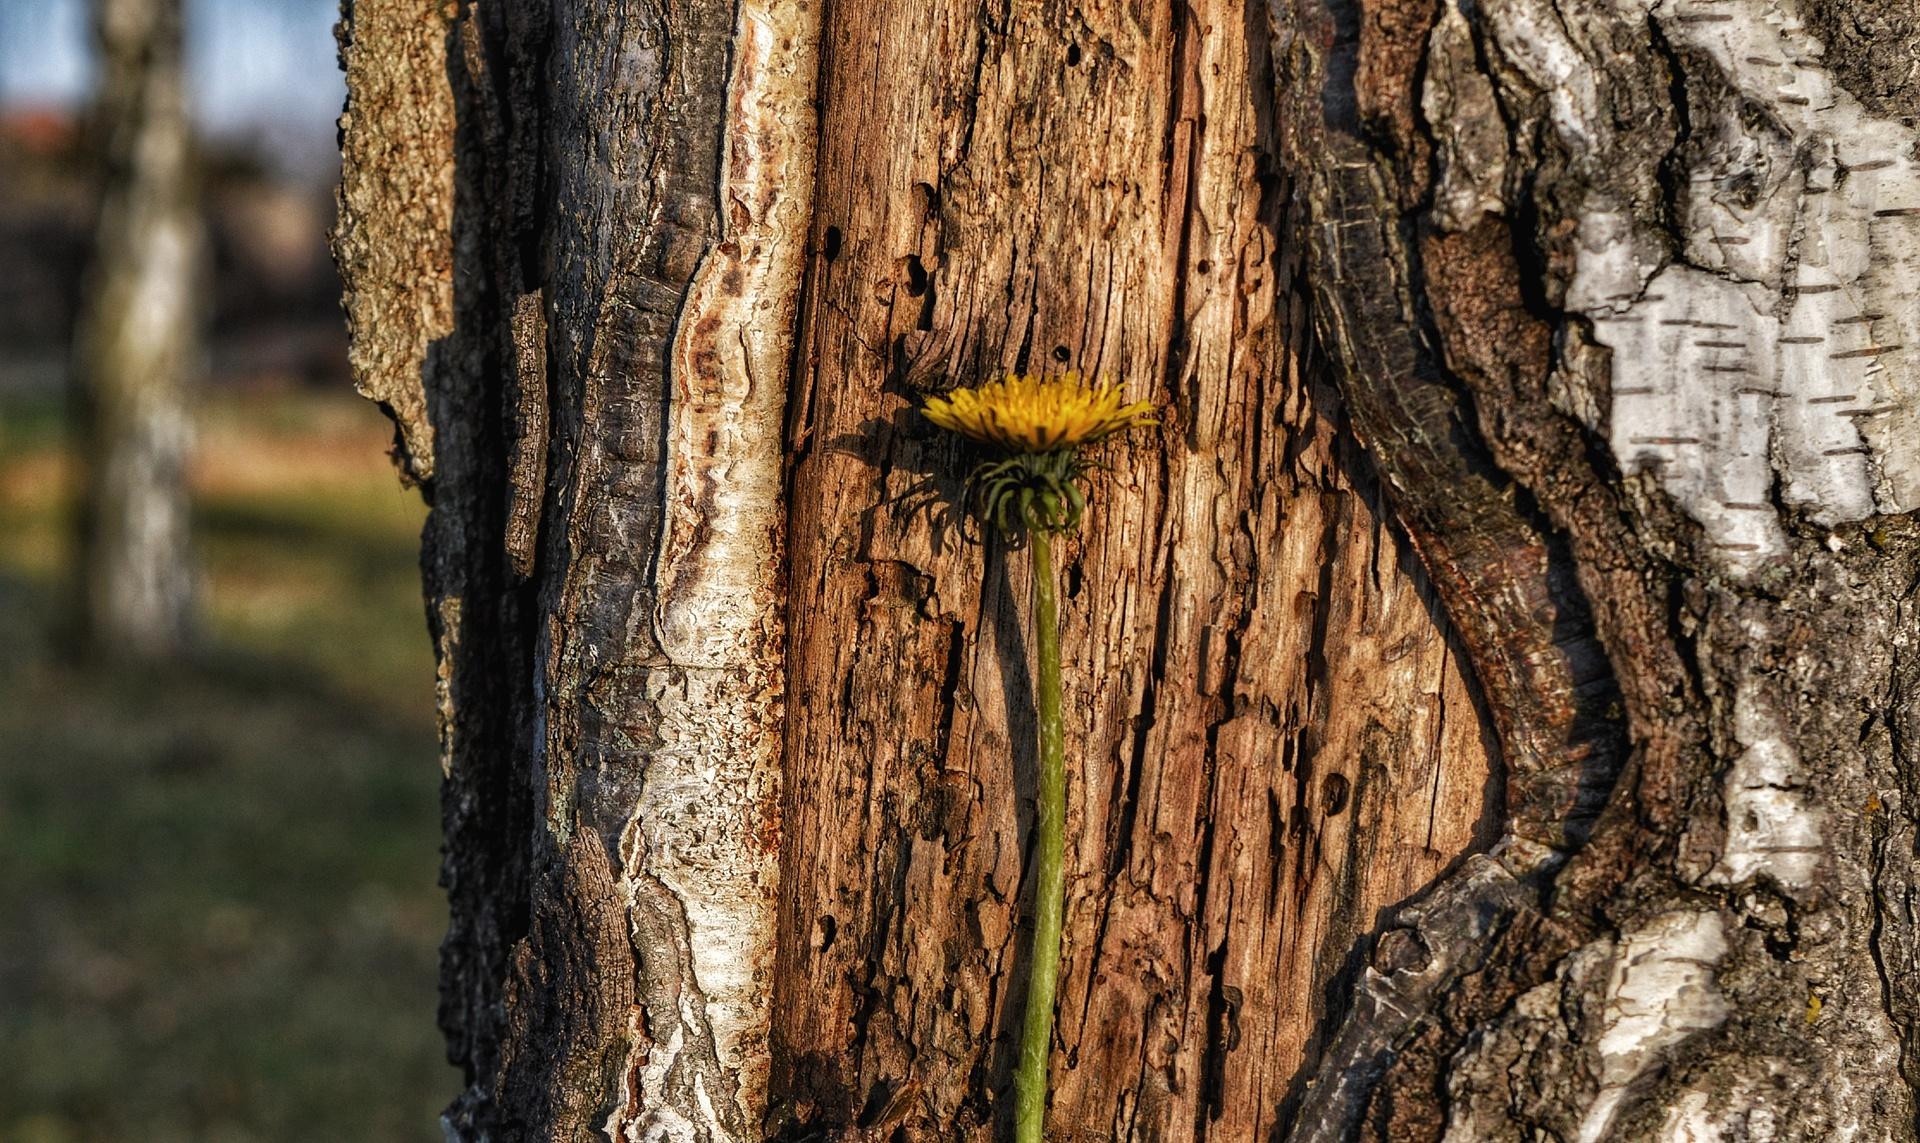 Bark, Tree, Wood, Trunk, Nature